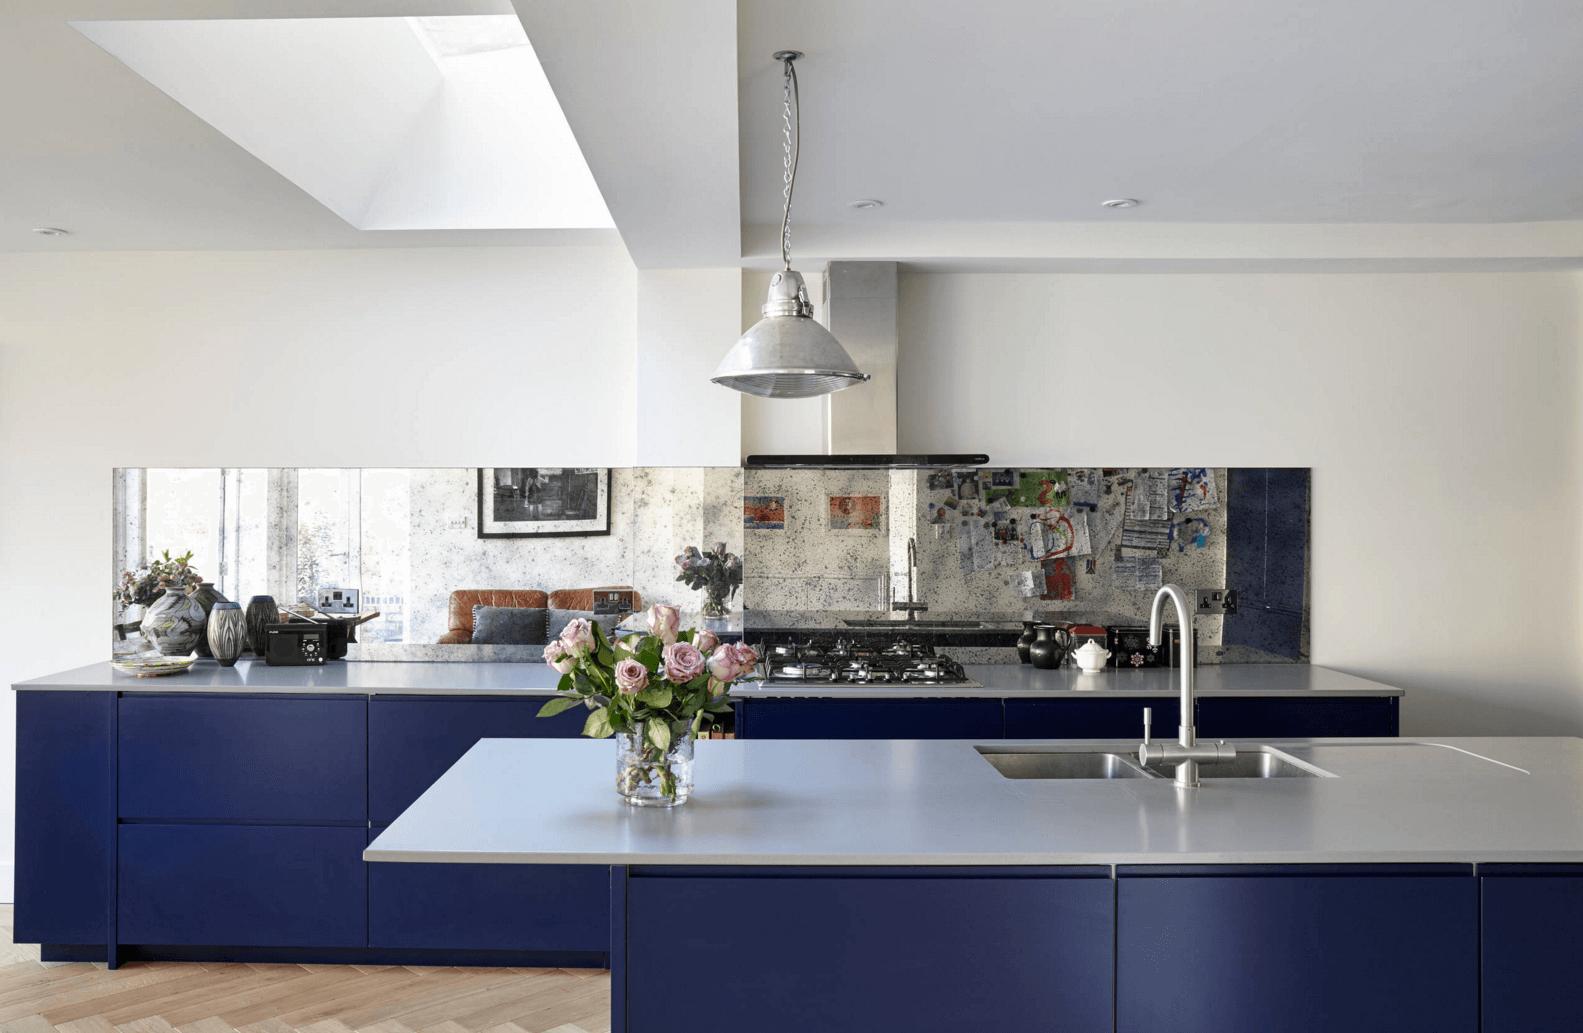 5 Ways To Redo Kitchen Backsplash (Without Tearing It Out